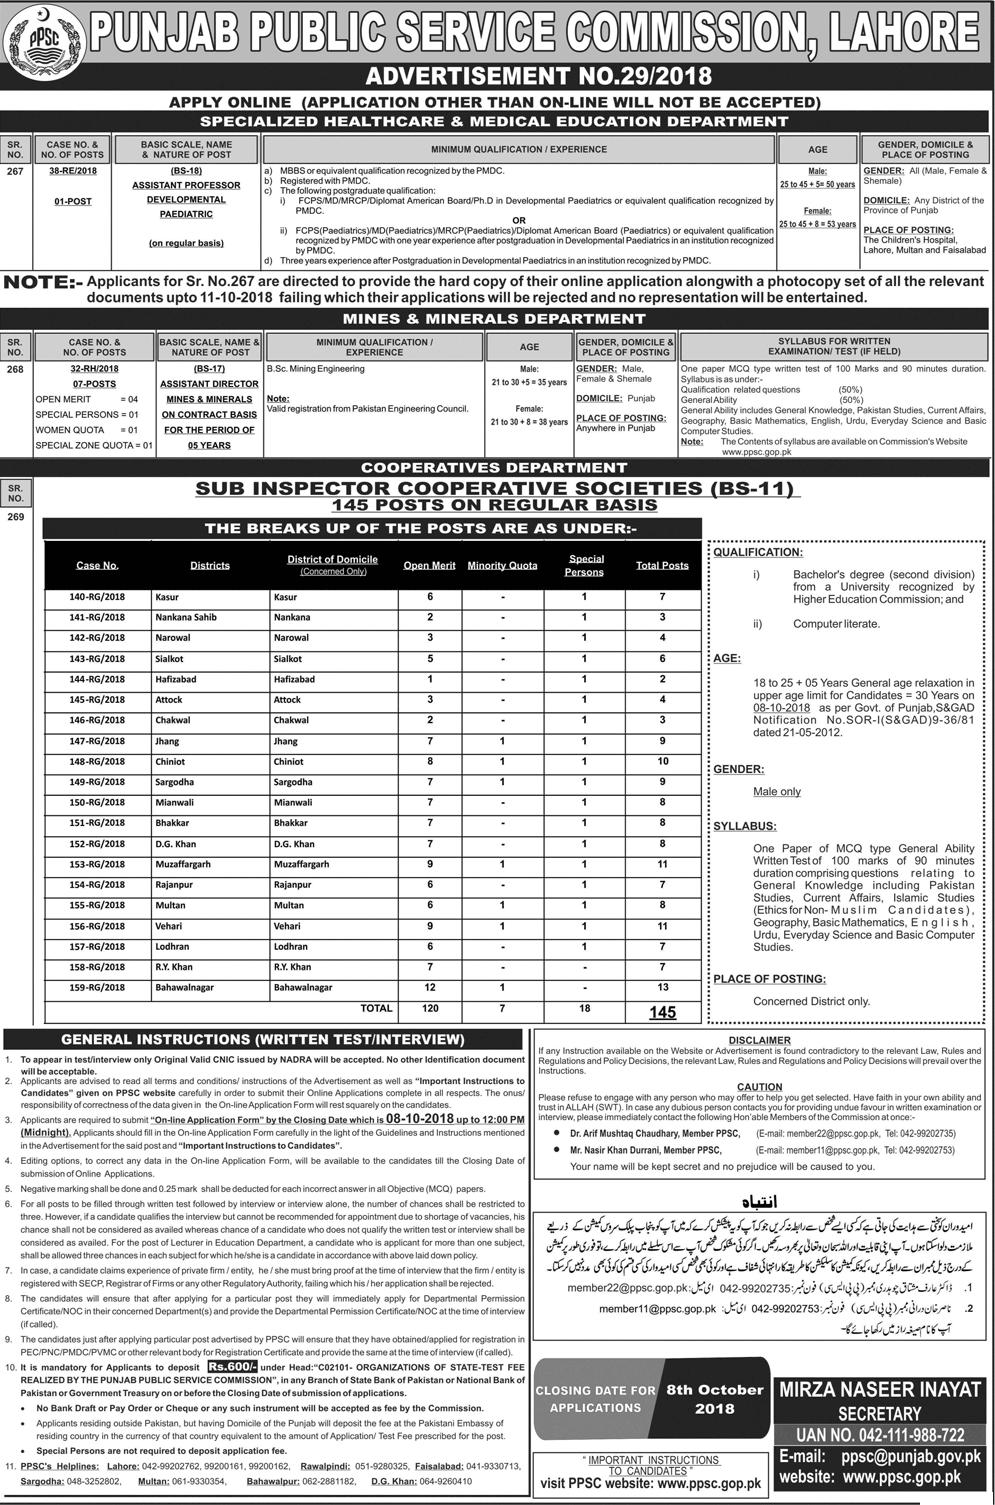 PPSC September Jobs Advertisement No 29/2018 Punjab Public Service Commission Lahore Apply Online